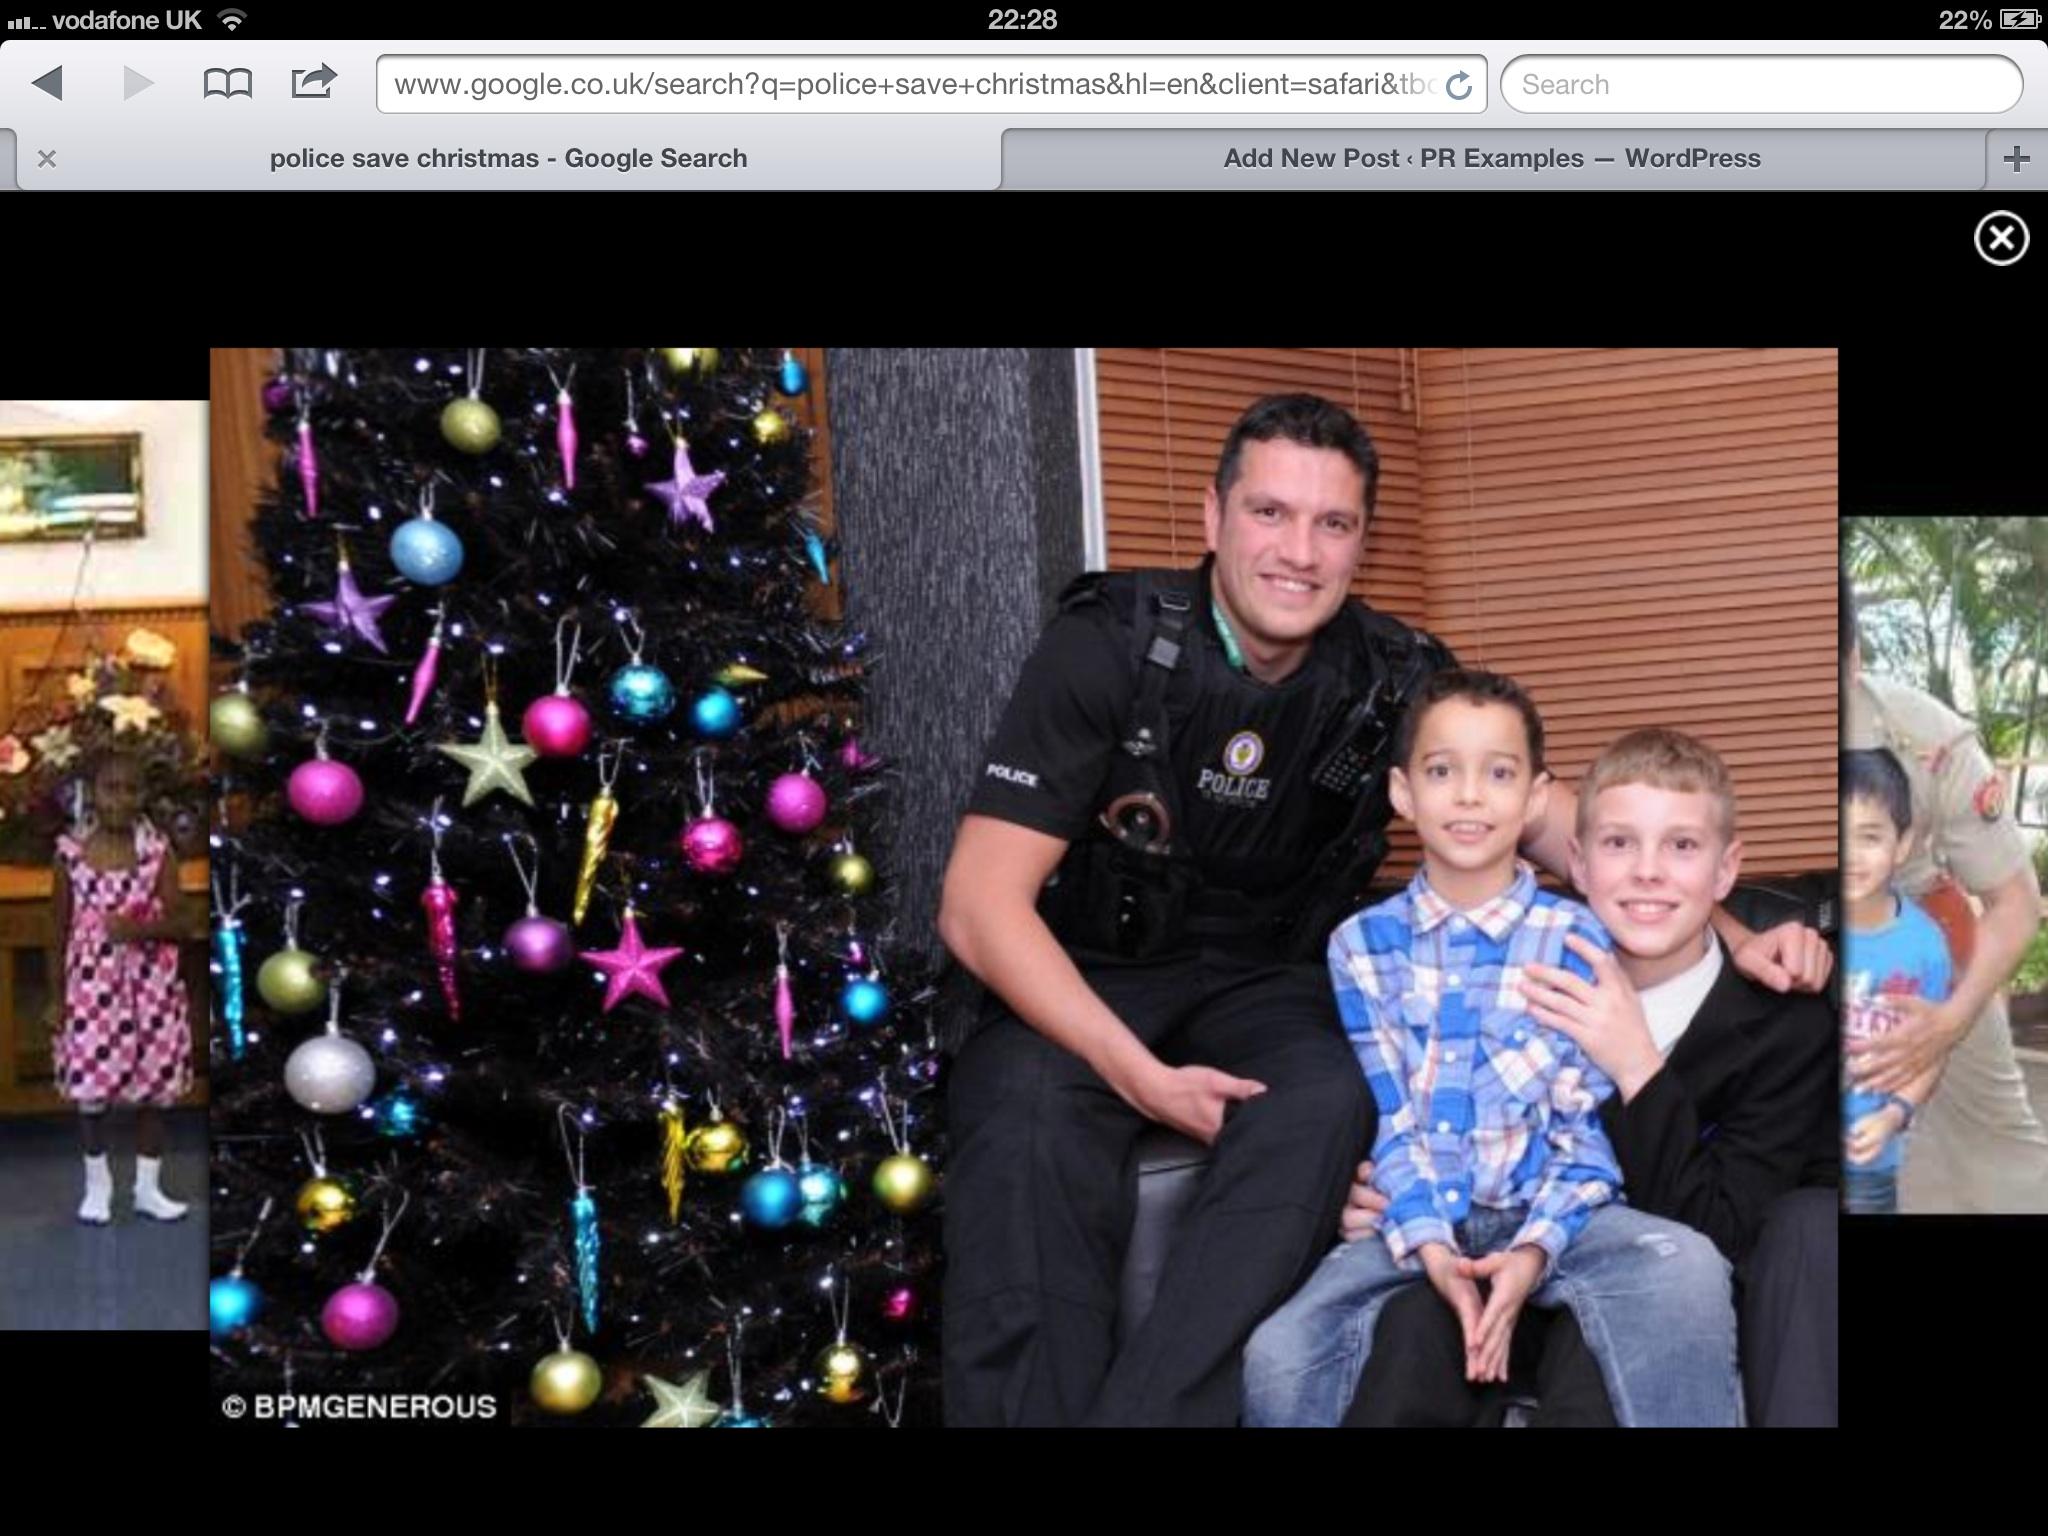 Police Play Santa Claus